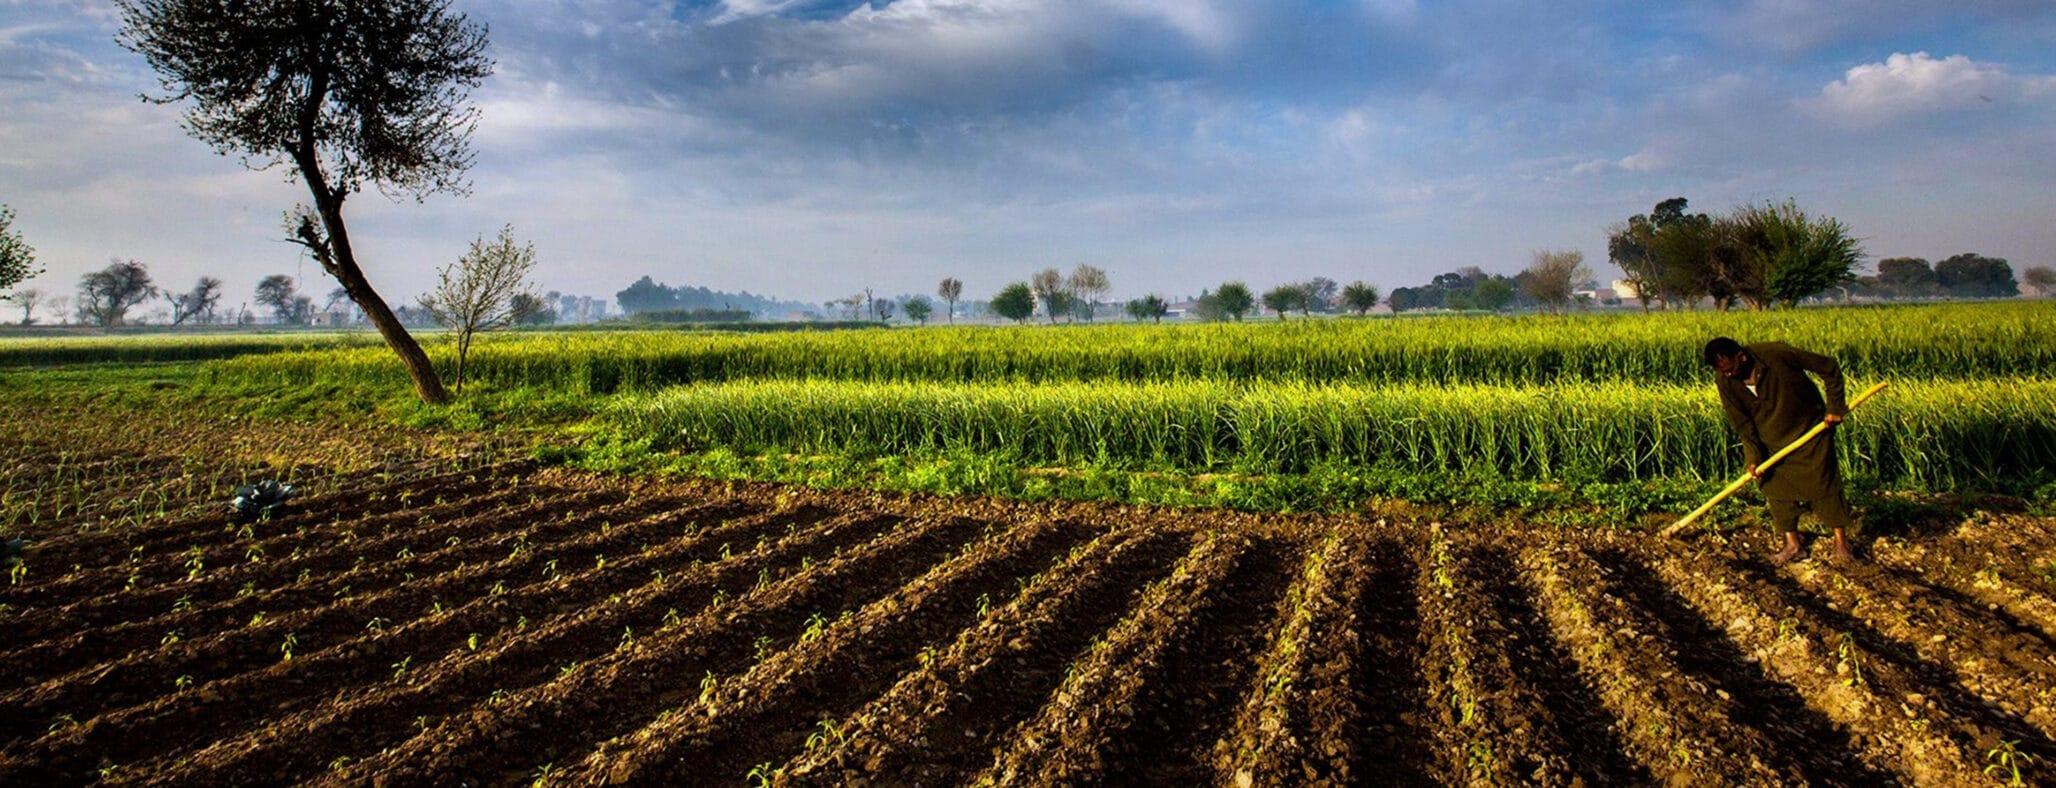 Investeren in landherstel levert (financiële) vruchten op!